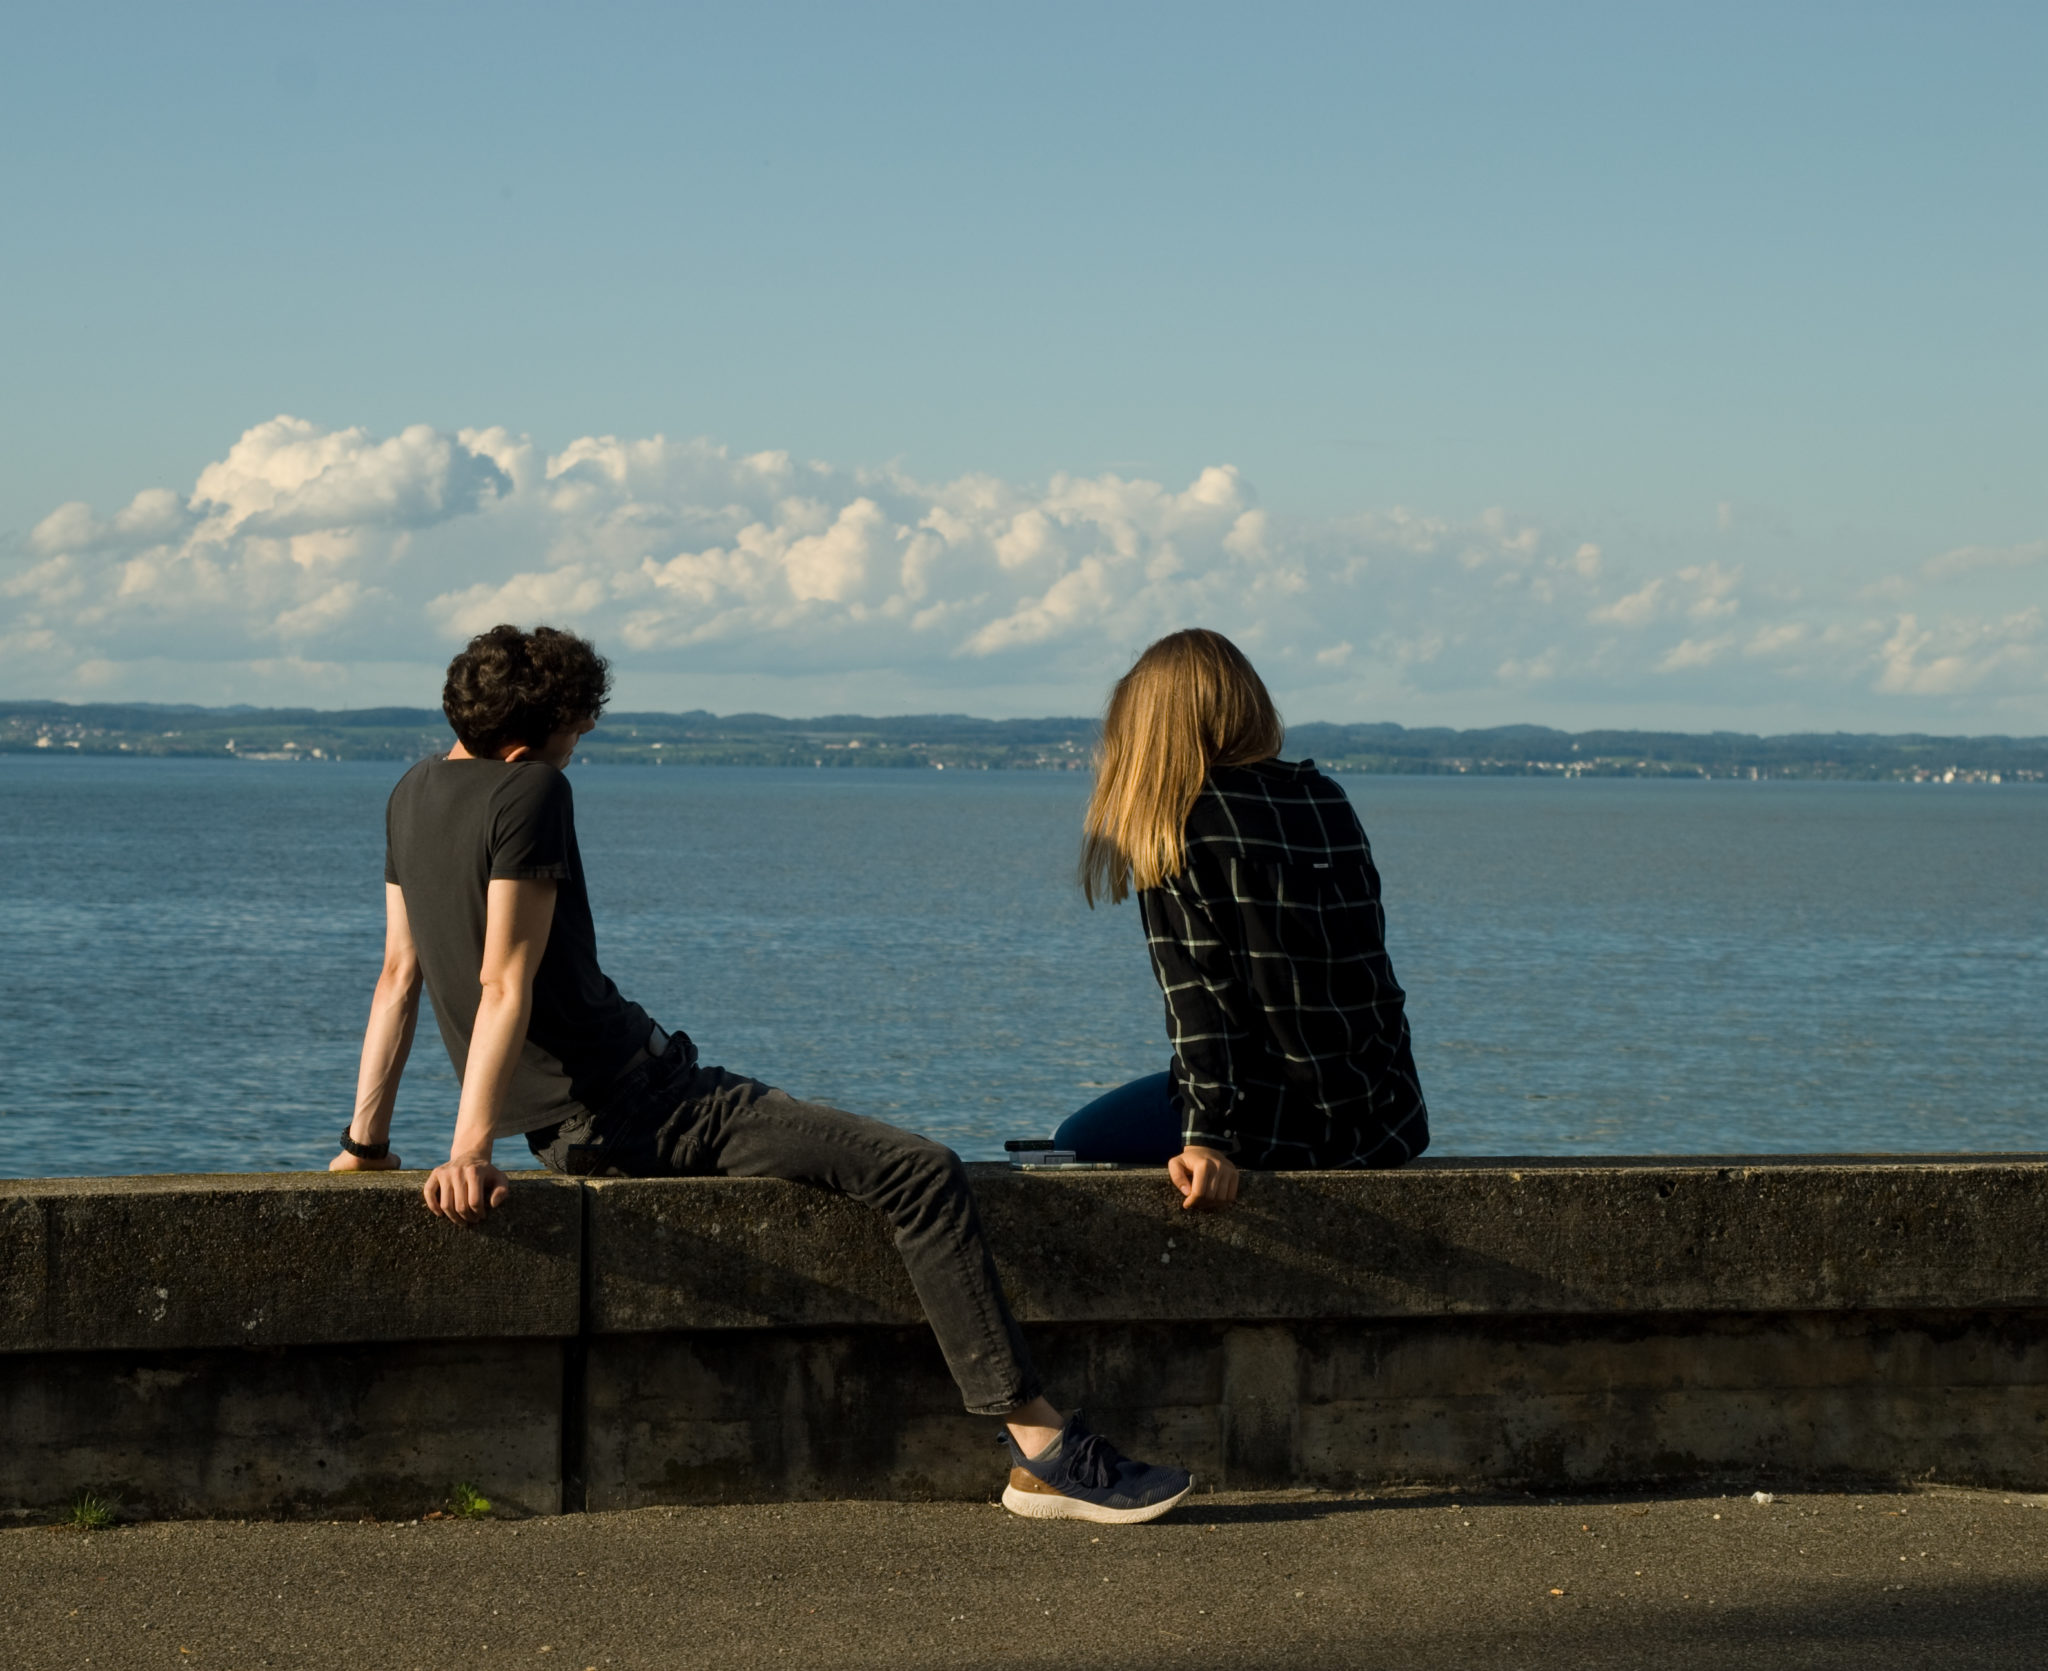 A pair and a lake